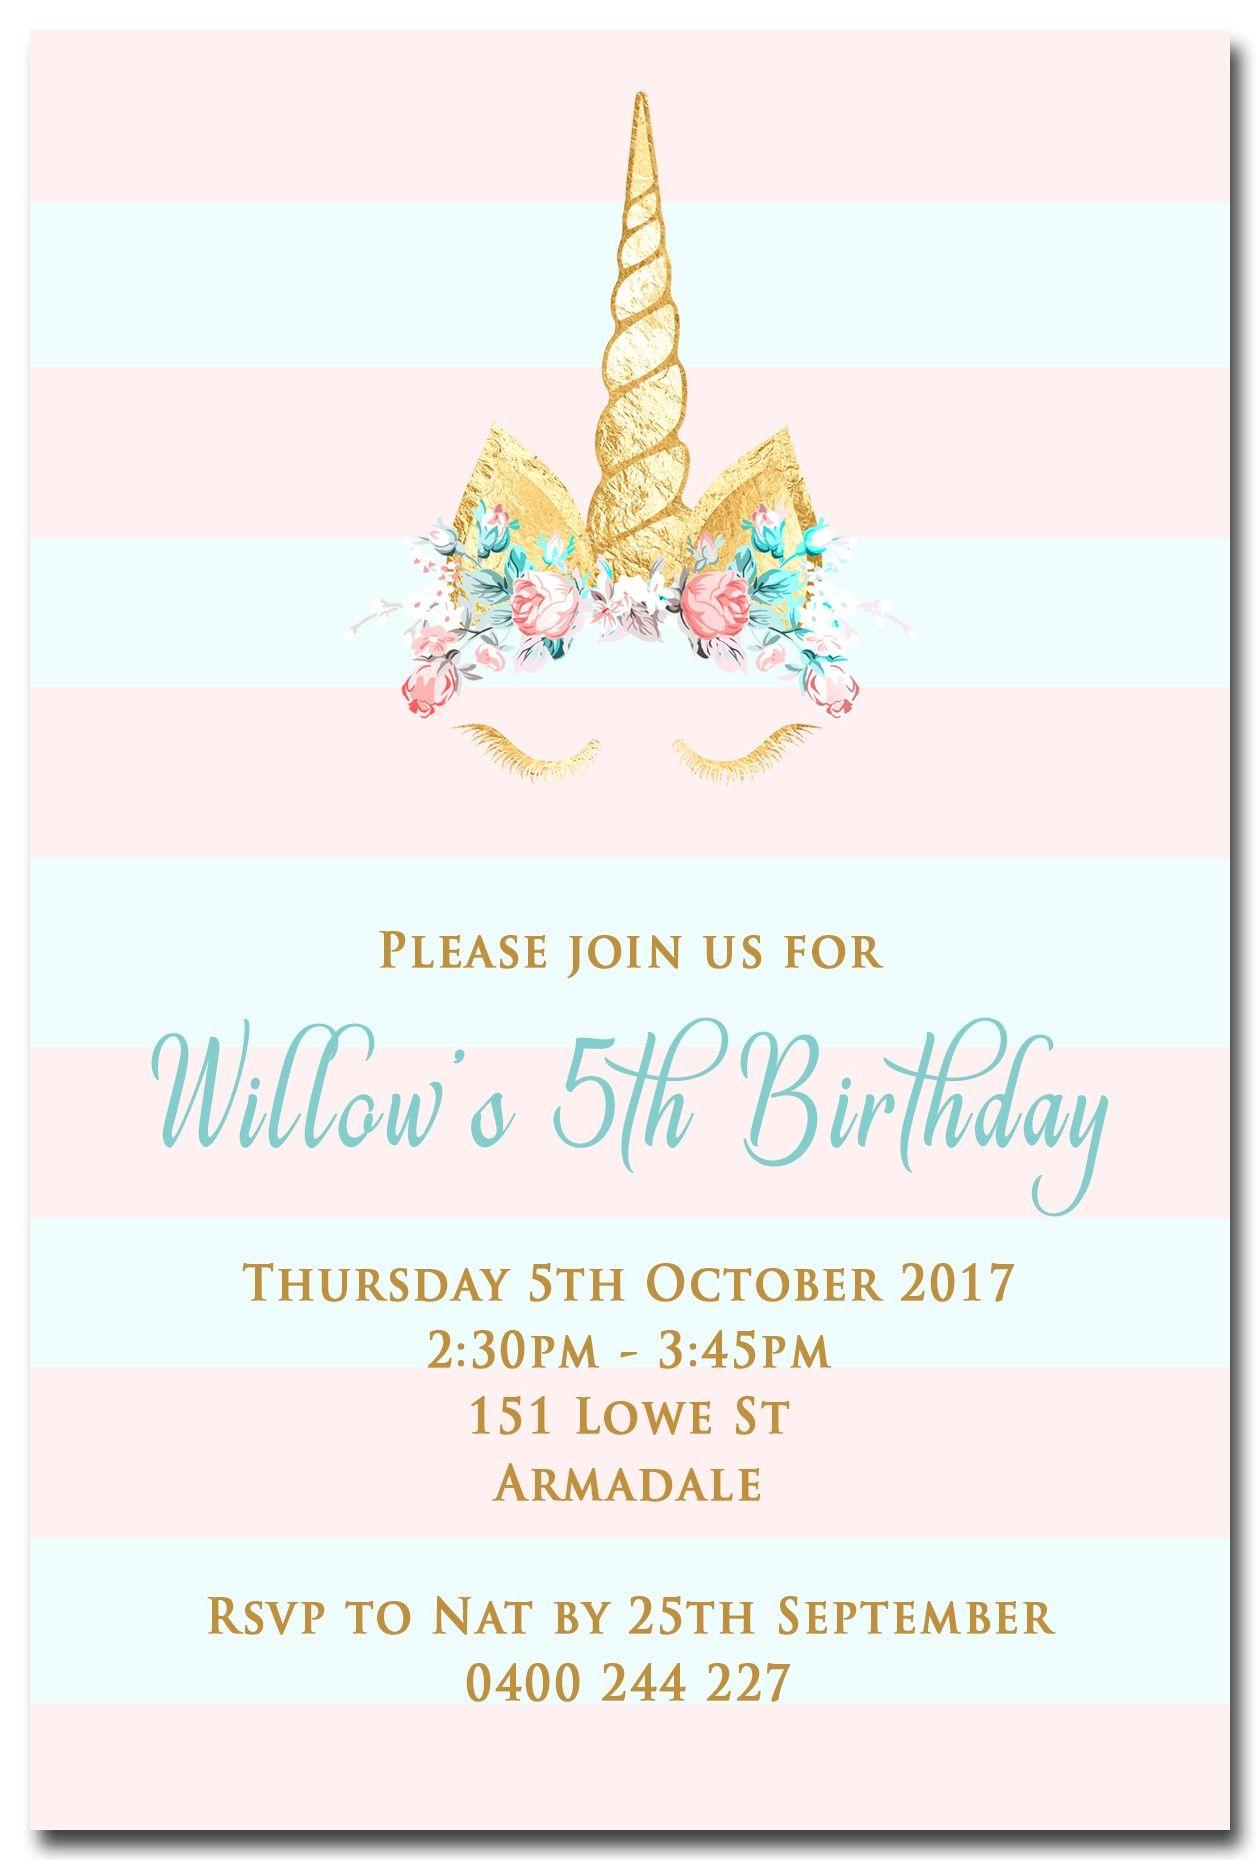 Birthday Party Invitations, Excellent Unicorn Birthday Invitations - Make Your Own Birthday Party Invitations Free Printable